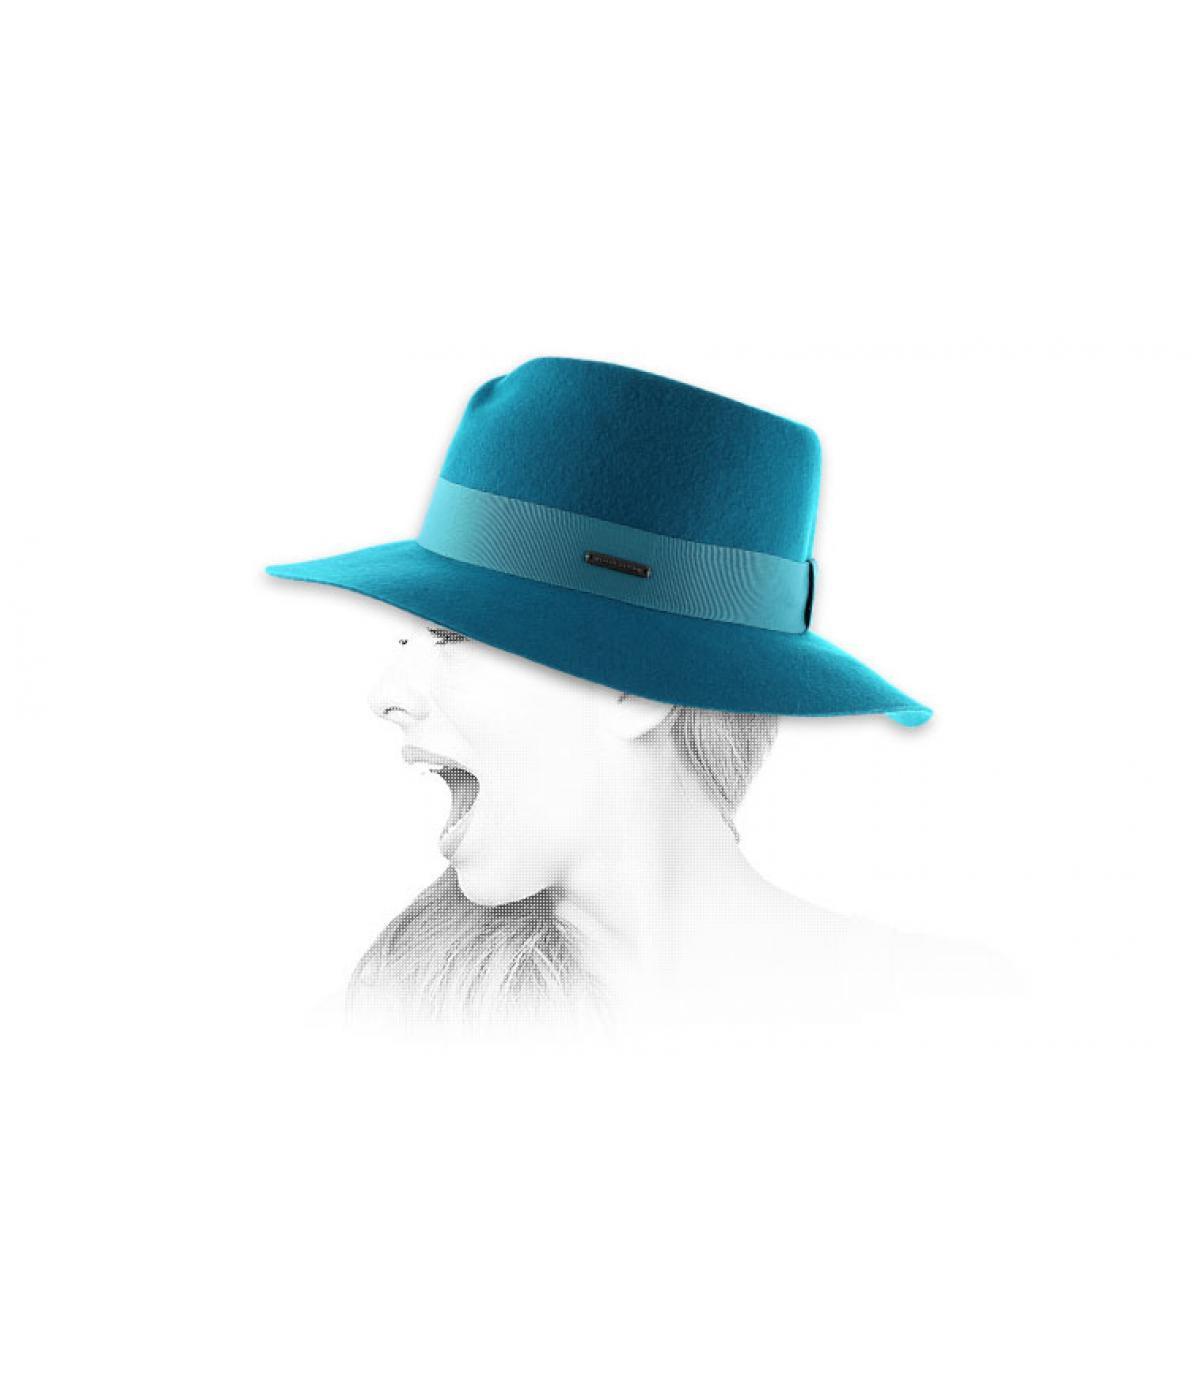 ... Sombrero mujer fedora azul - Fedora petrol Seeberger imagen 4 97649d7b2c27